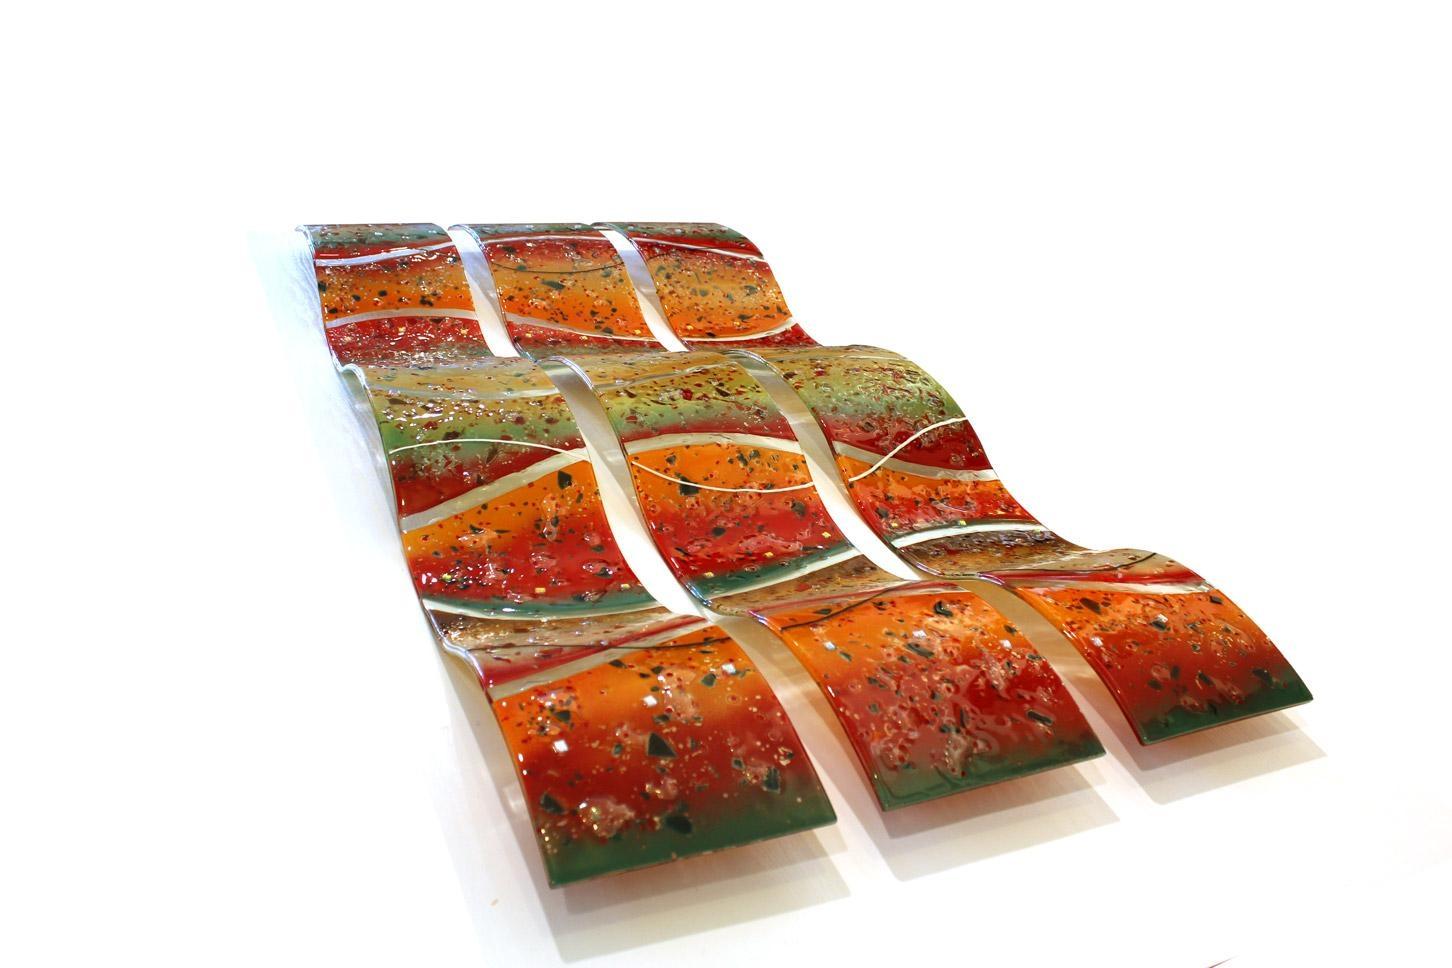 Unique Glass Art Archives | Linear Glass Art | Fused Glass Wall Art With Regard To Fused Glass Wall Art (View 13 of 20)